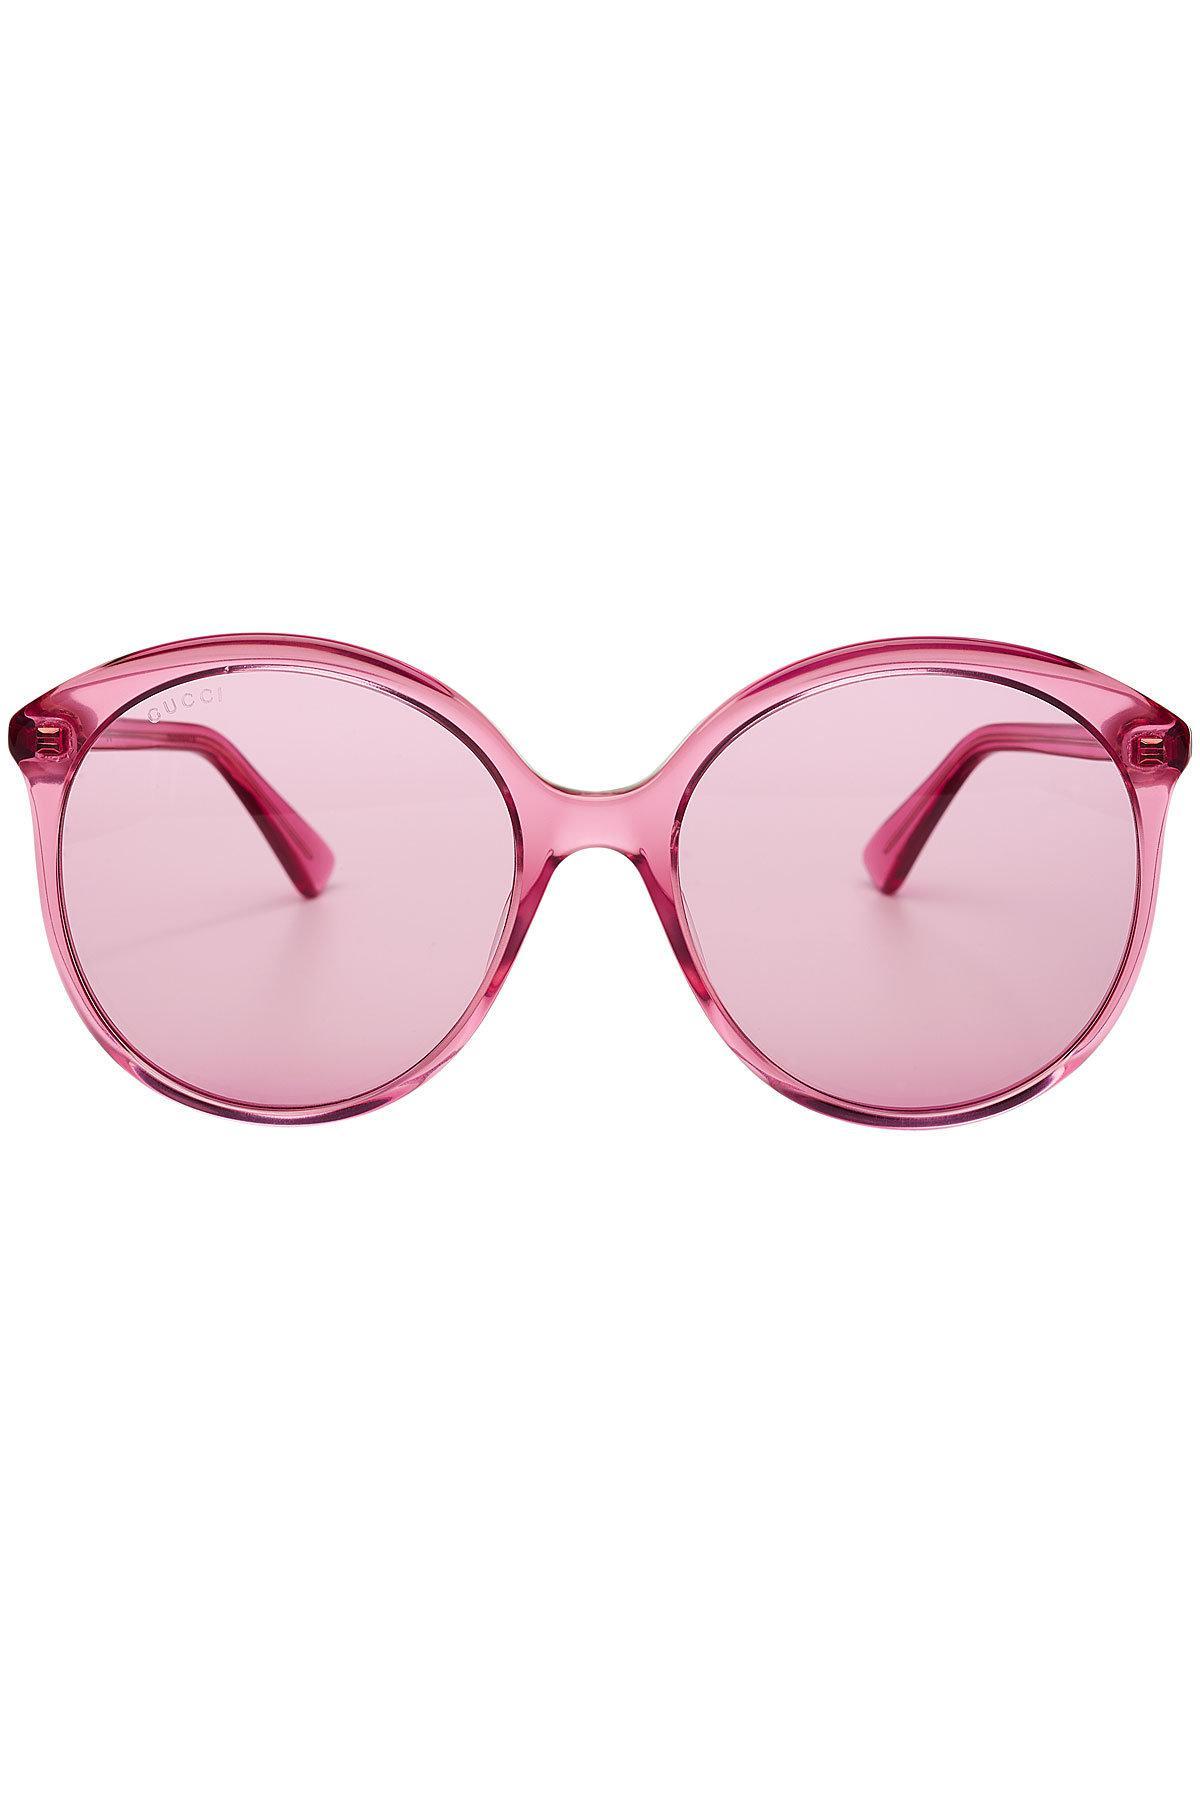 dbb2852dc9 Lyst - Gucci Sunglasses in Pink